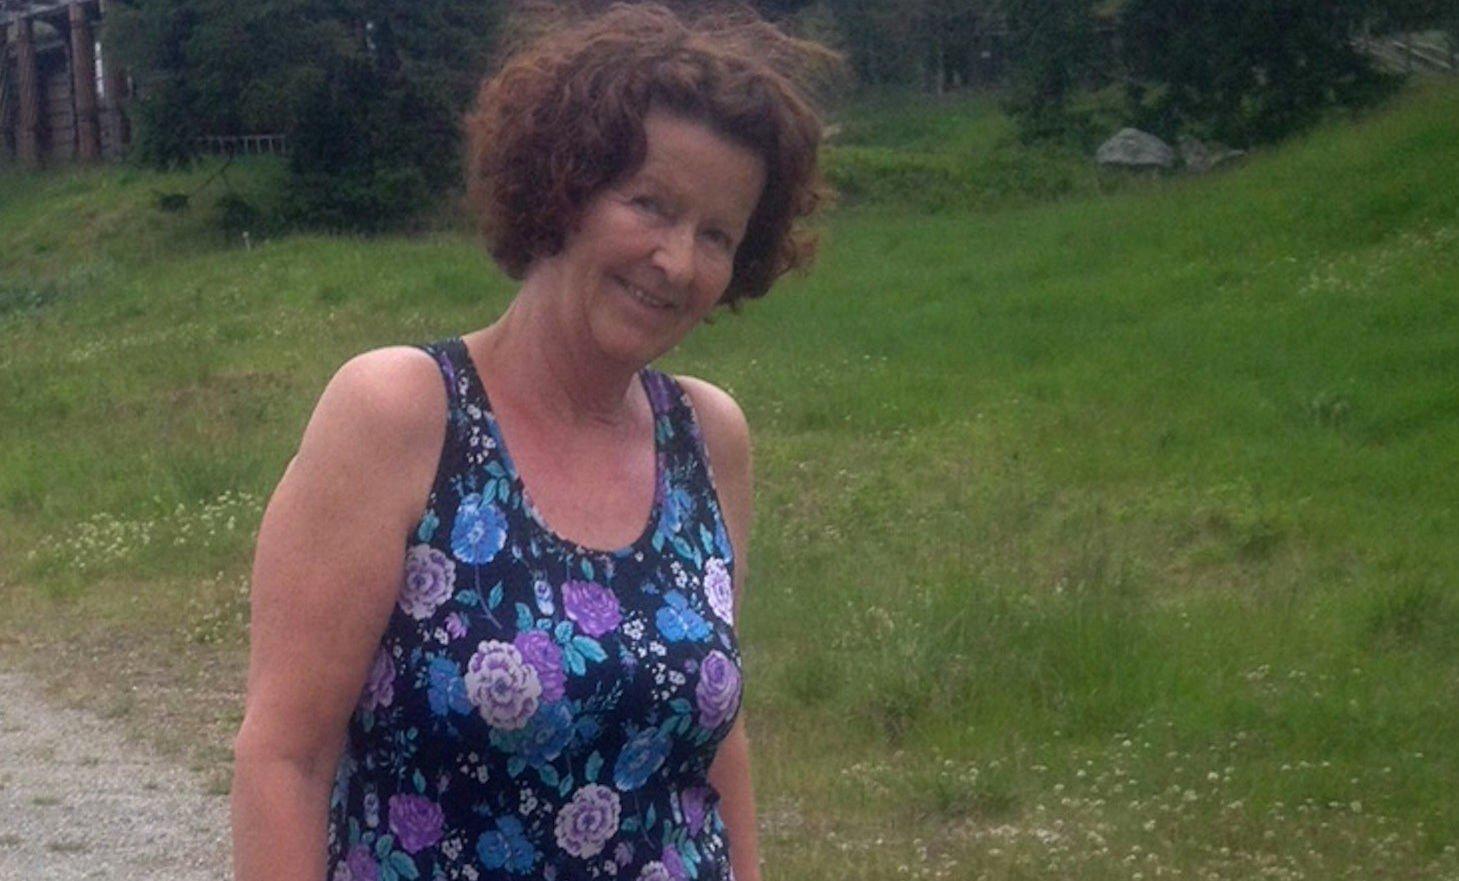 Anne-Elisabeth Hagen  (69) kan være drept. Det  melder Oslo politiet idag